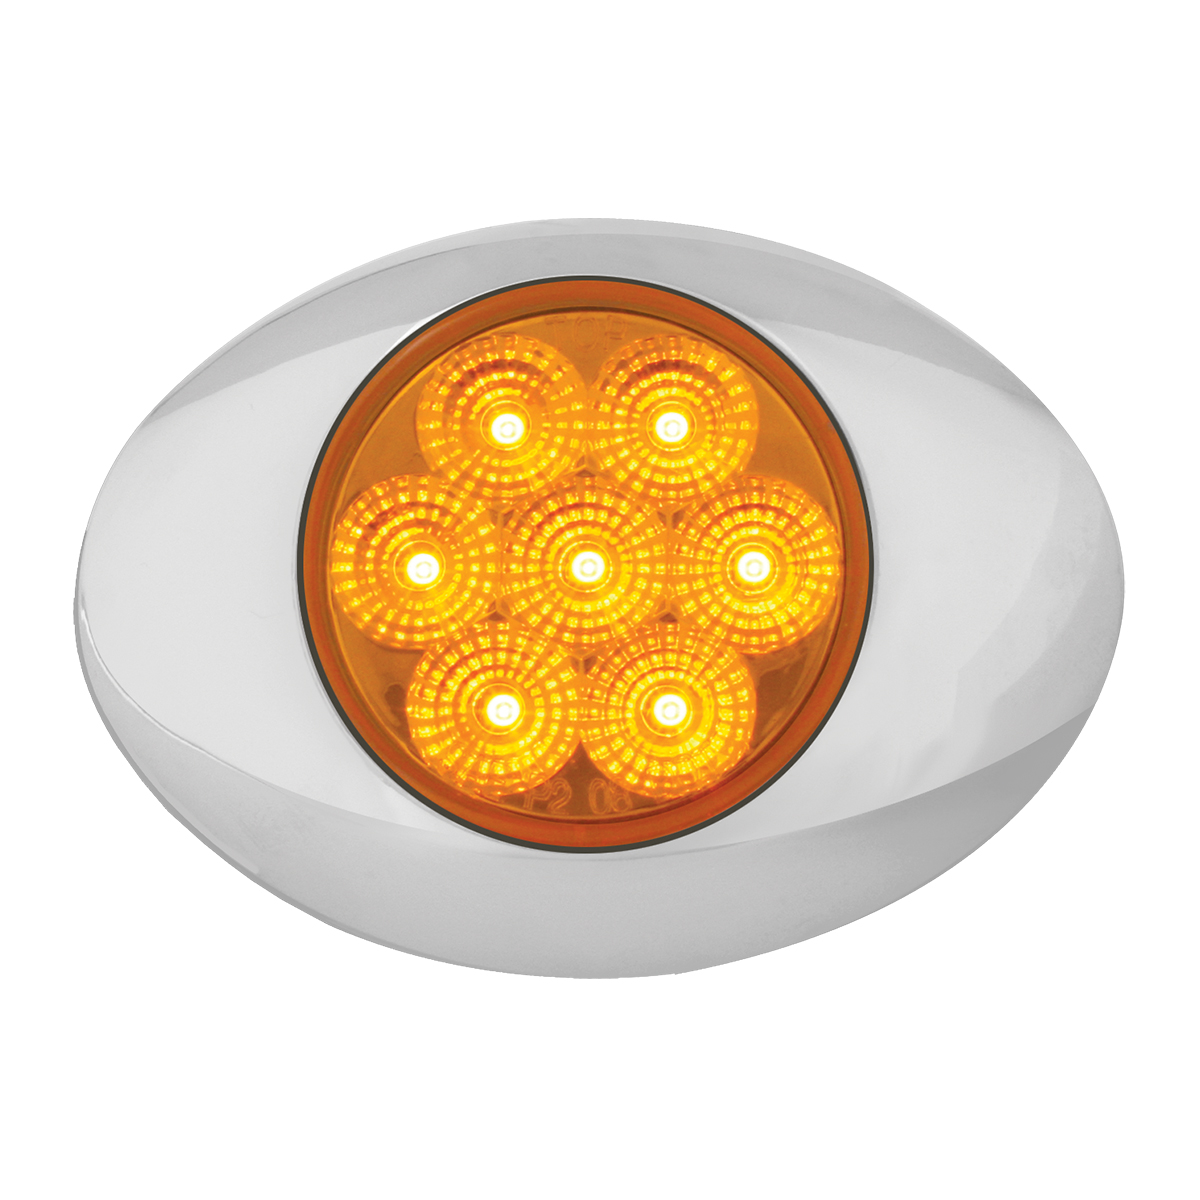 Small Spyder LED Light in Amber/Amber with Chrome Bezel